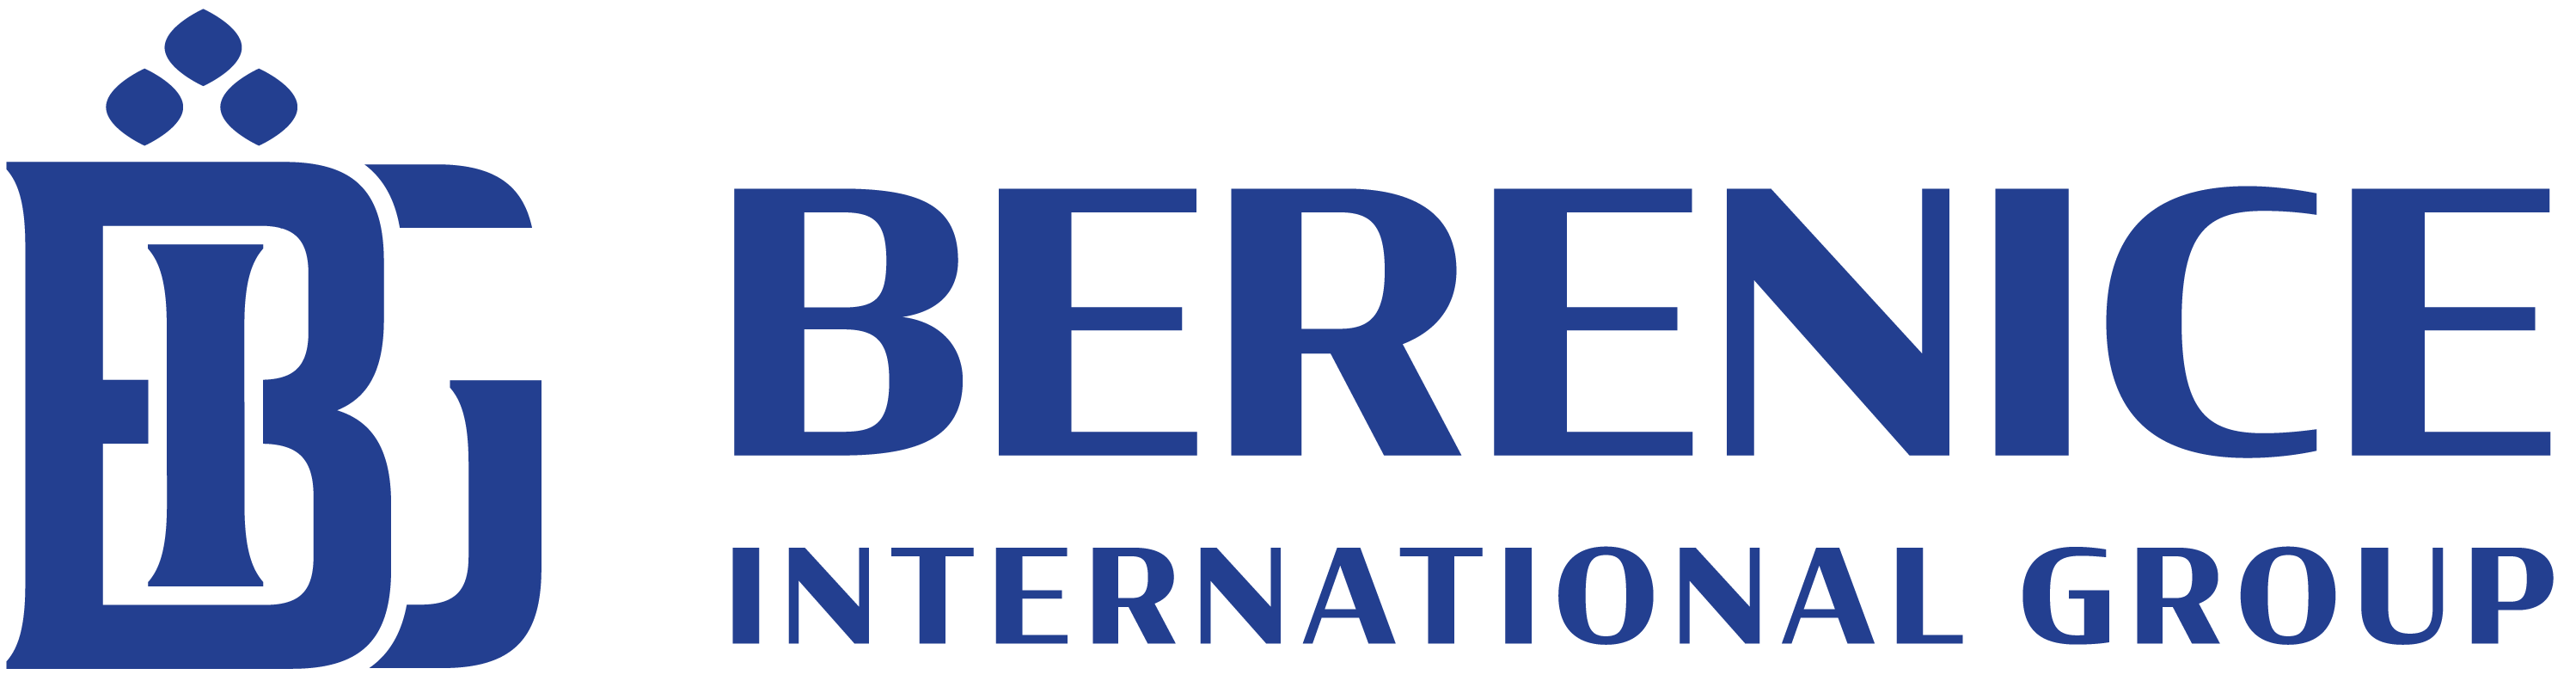 Berenice International Group